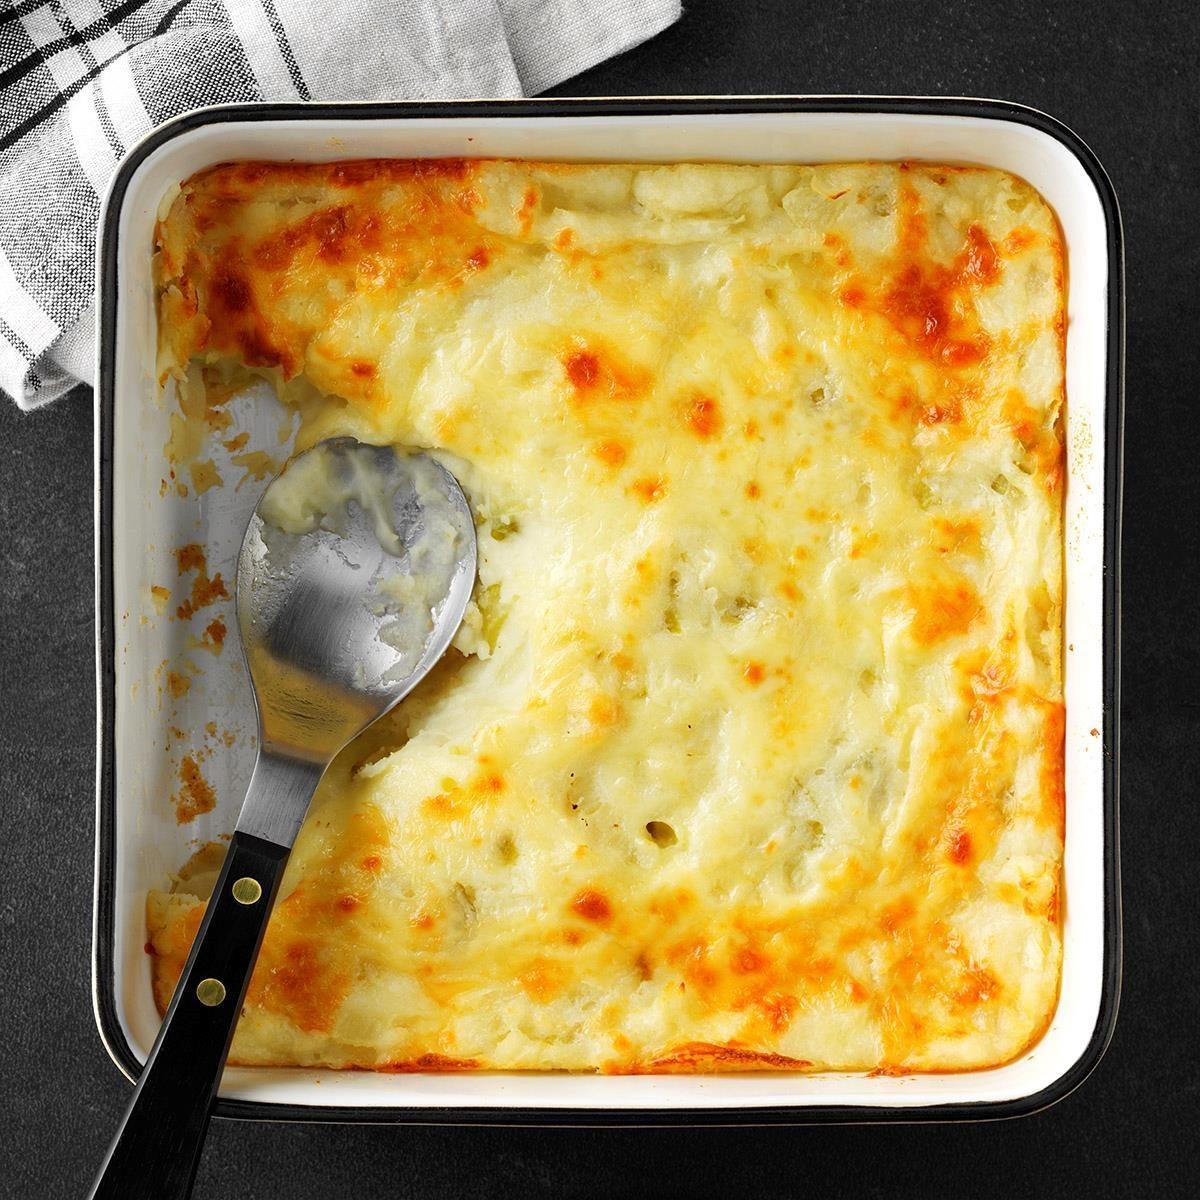 Mozzarella Mashed Potato Remix